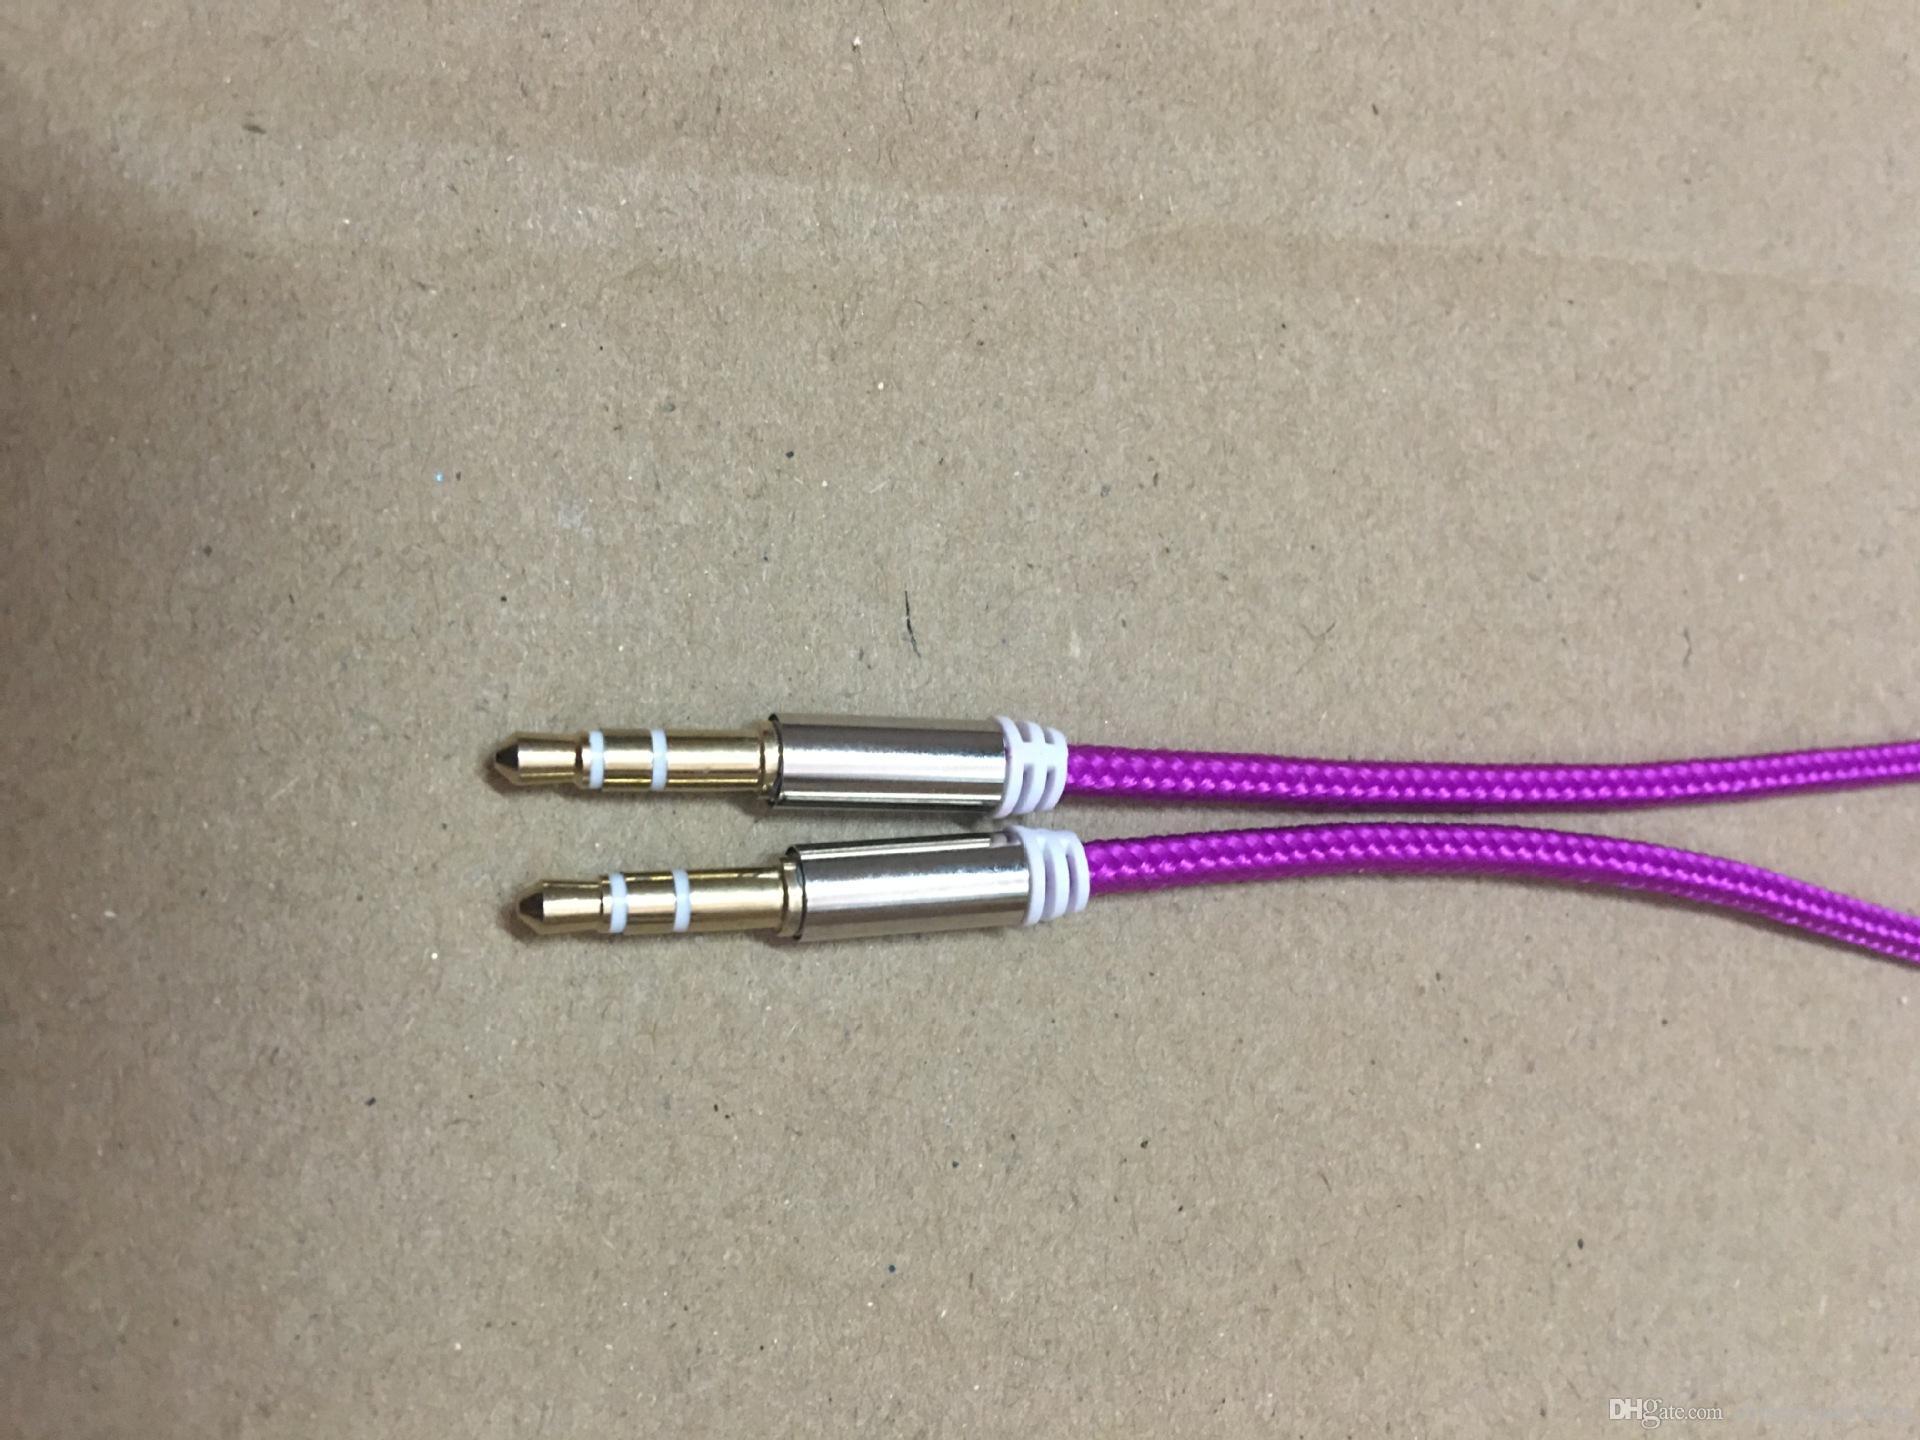 10 Färg Aluminiummetalladapter Nylon flätad vävduk 3.5mm Stereo Audio Aux Cable 1m 3FT /